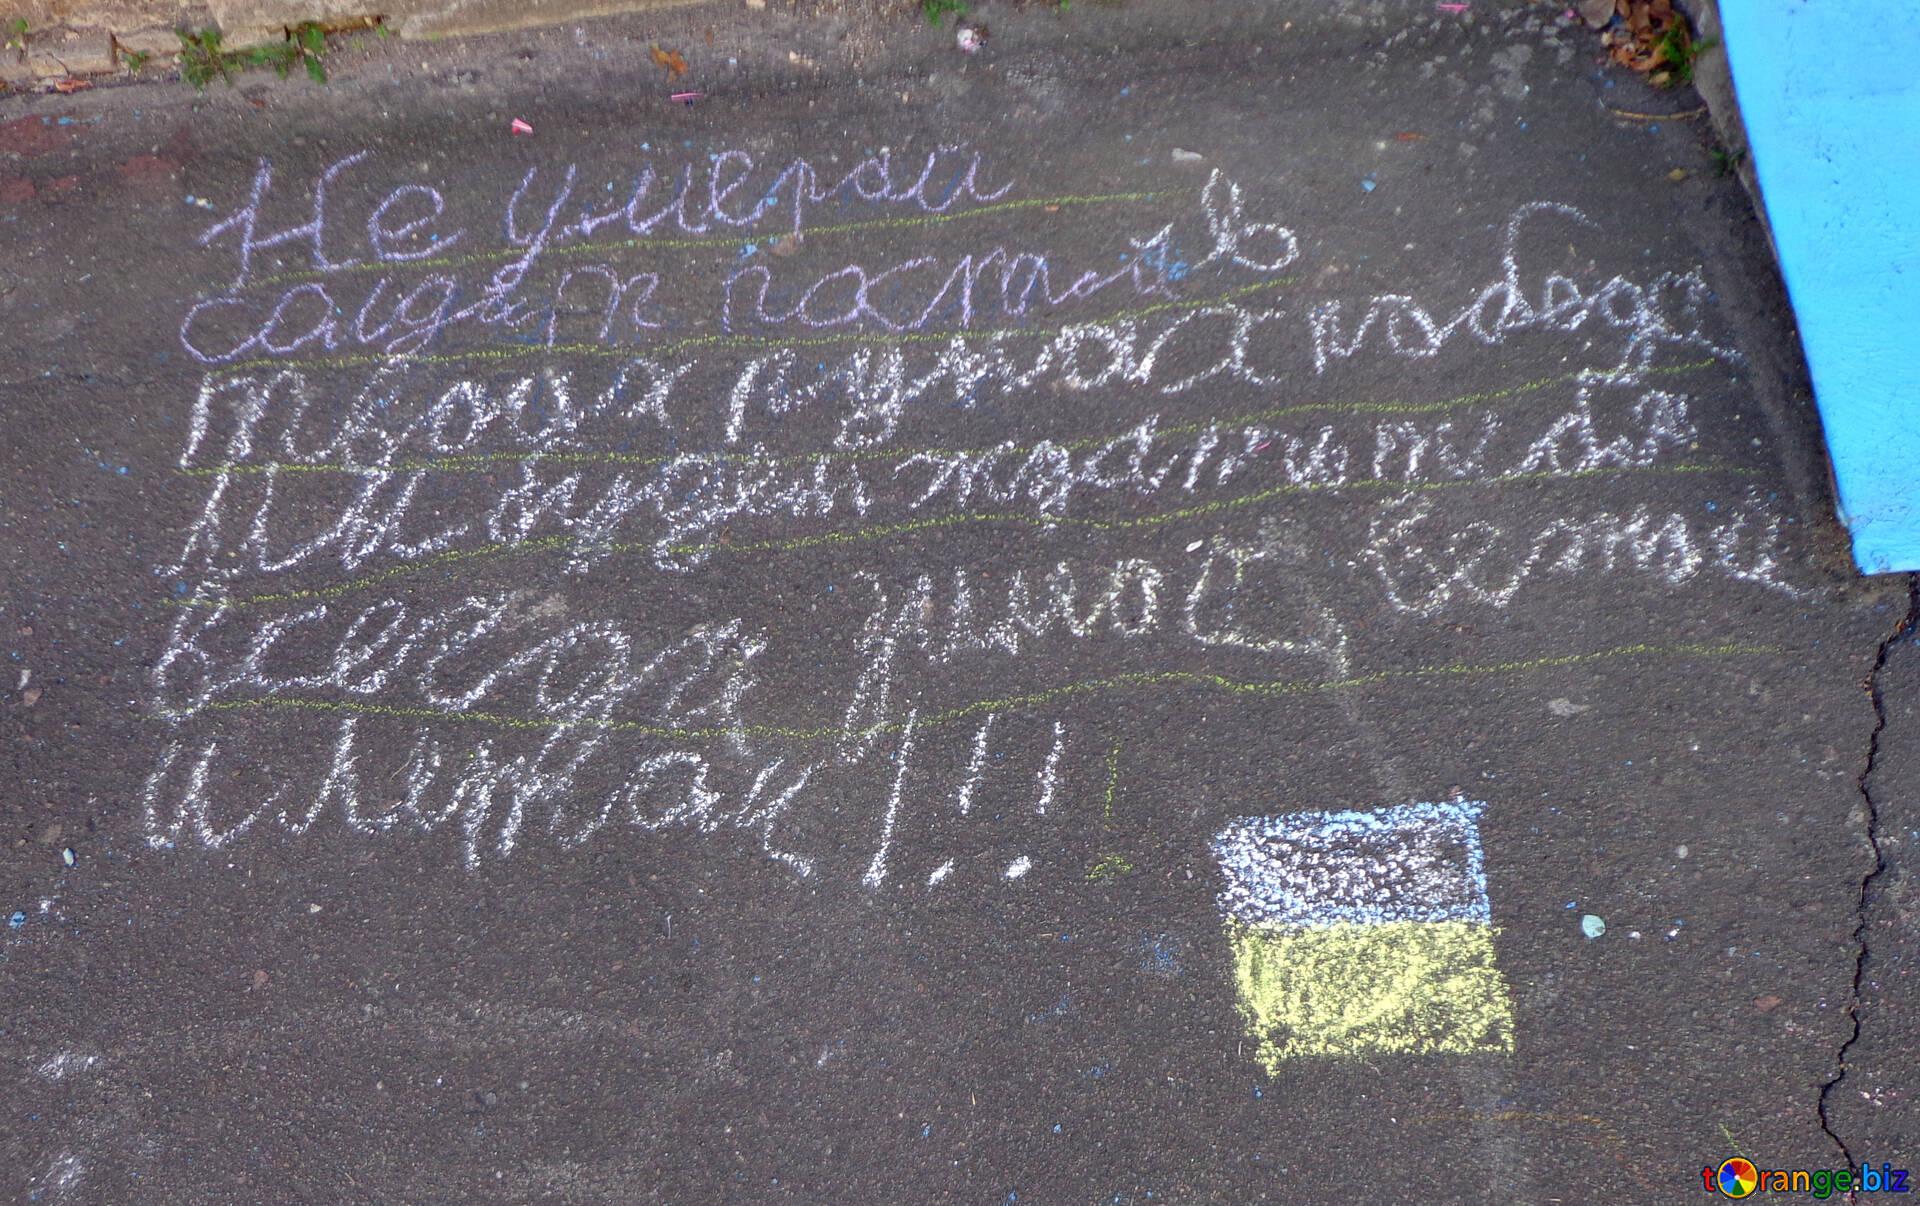 children chalk drawings letter from soldier of chalk on asphalt road